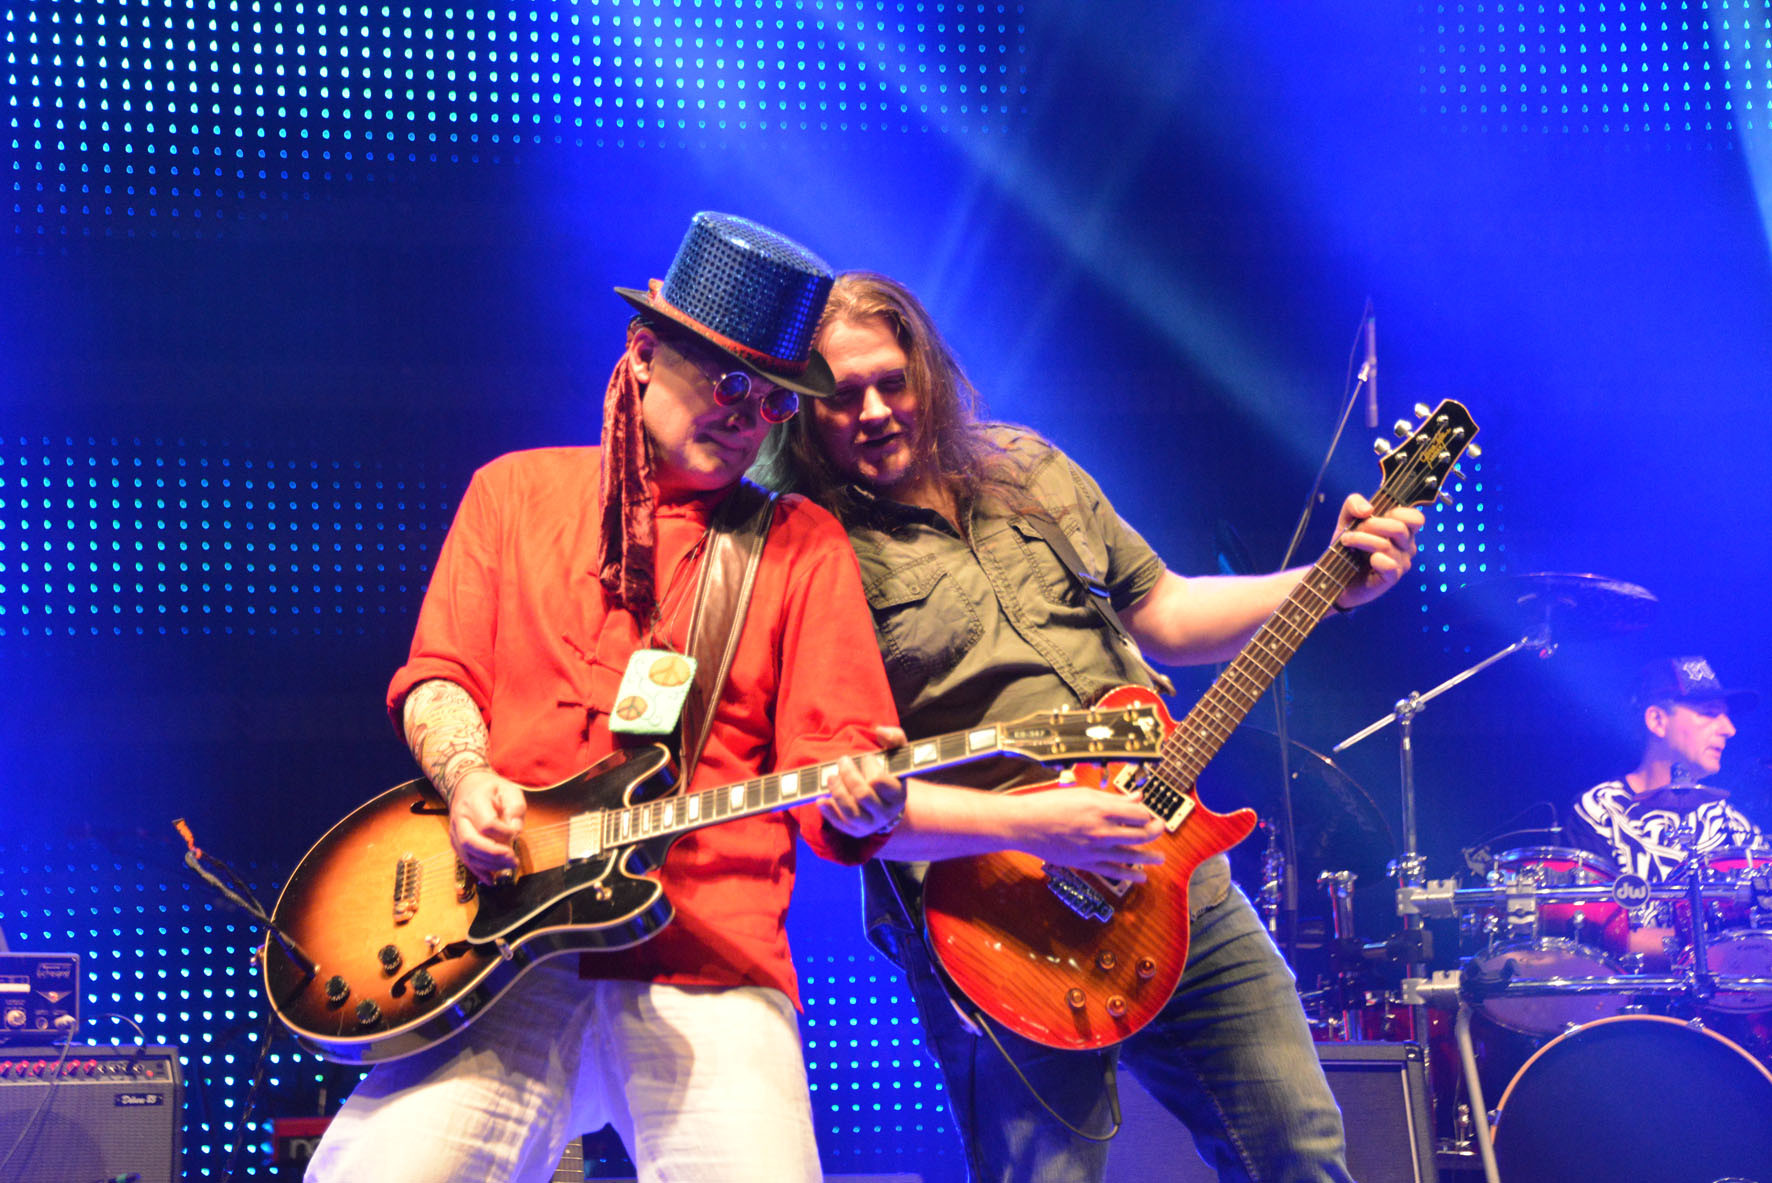 Hans - Solo & Rythmusgitarre und Andi - Solo & Rythmusgitarre